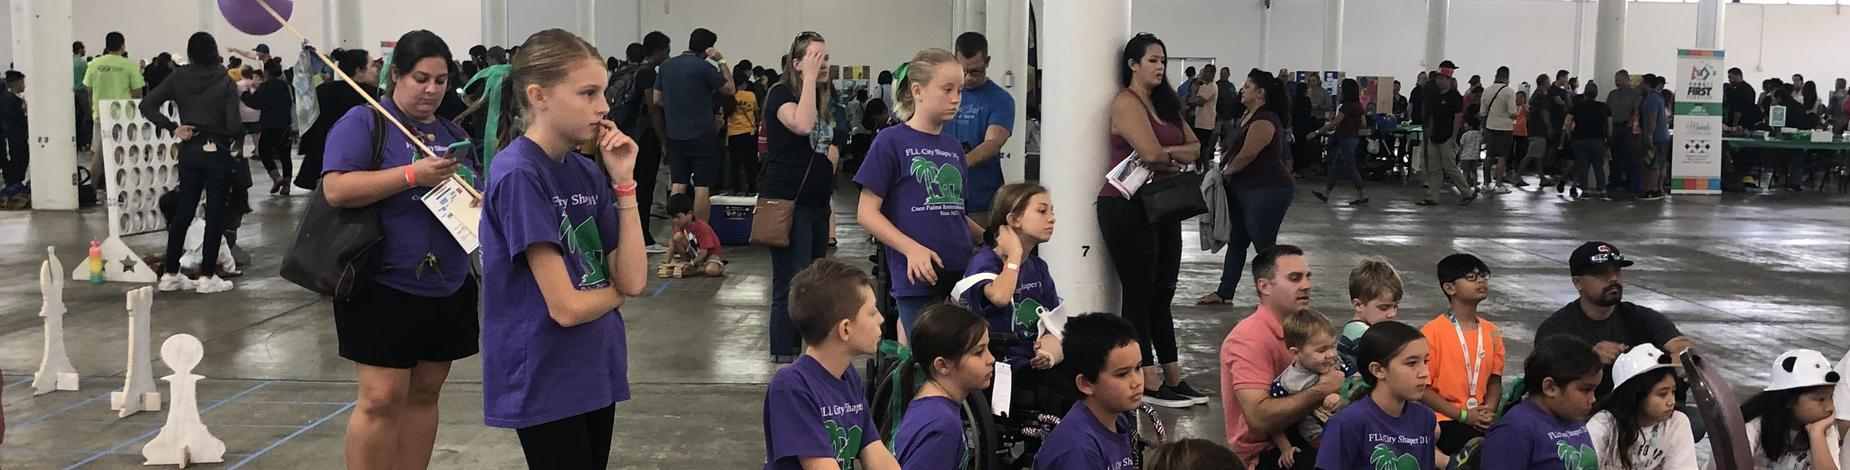 Watching high school robots in action!